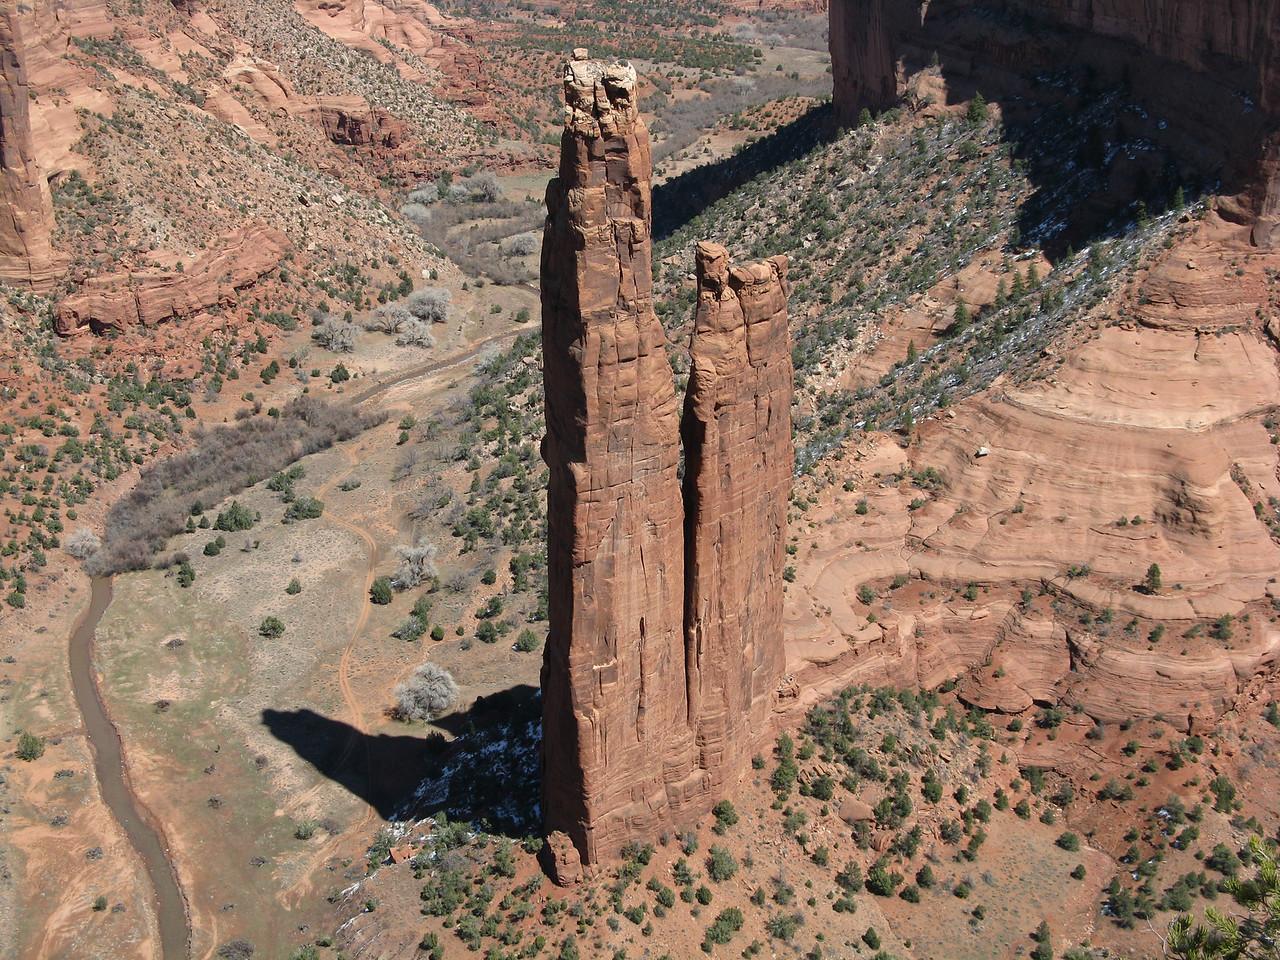 Spider Rock, seen from the overlook.